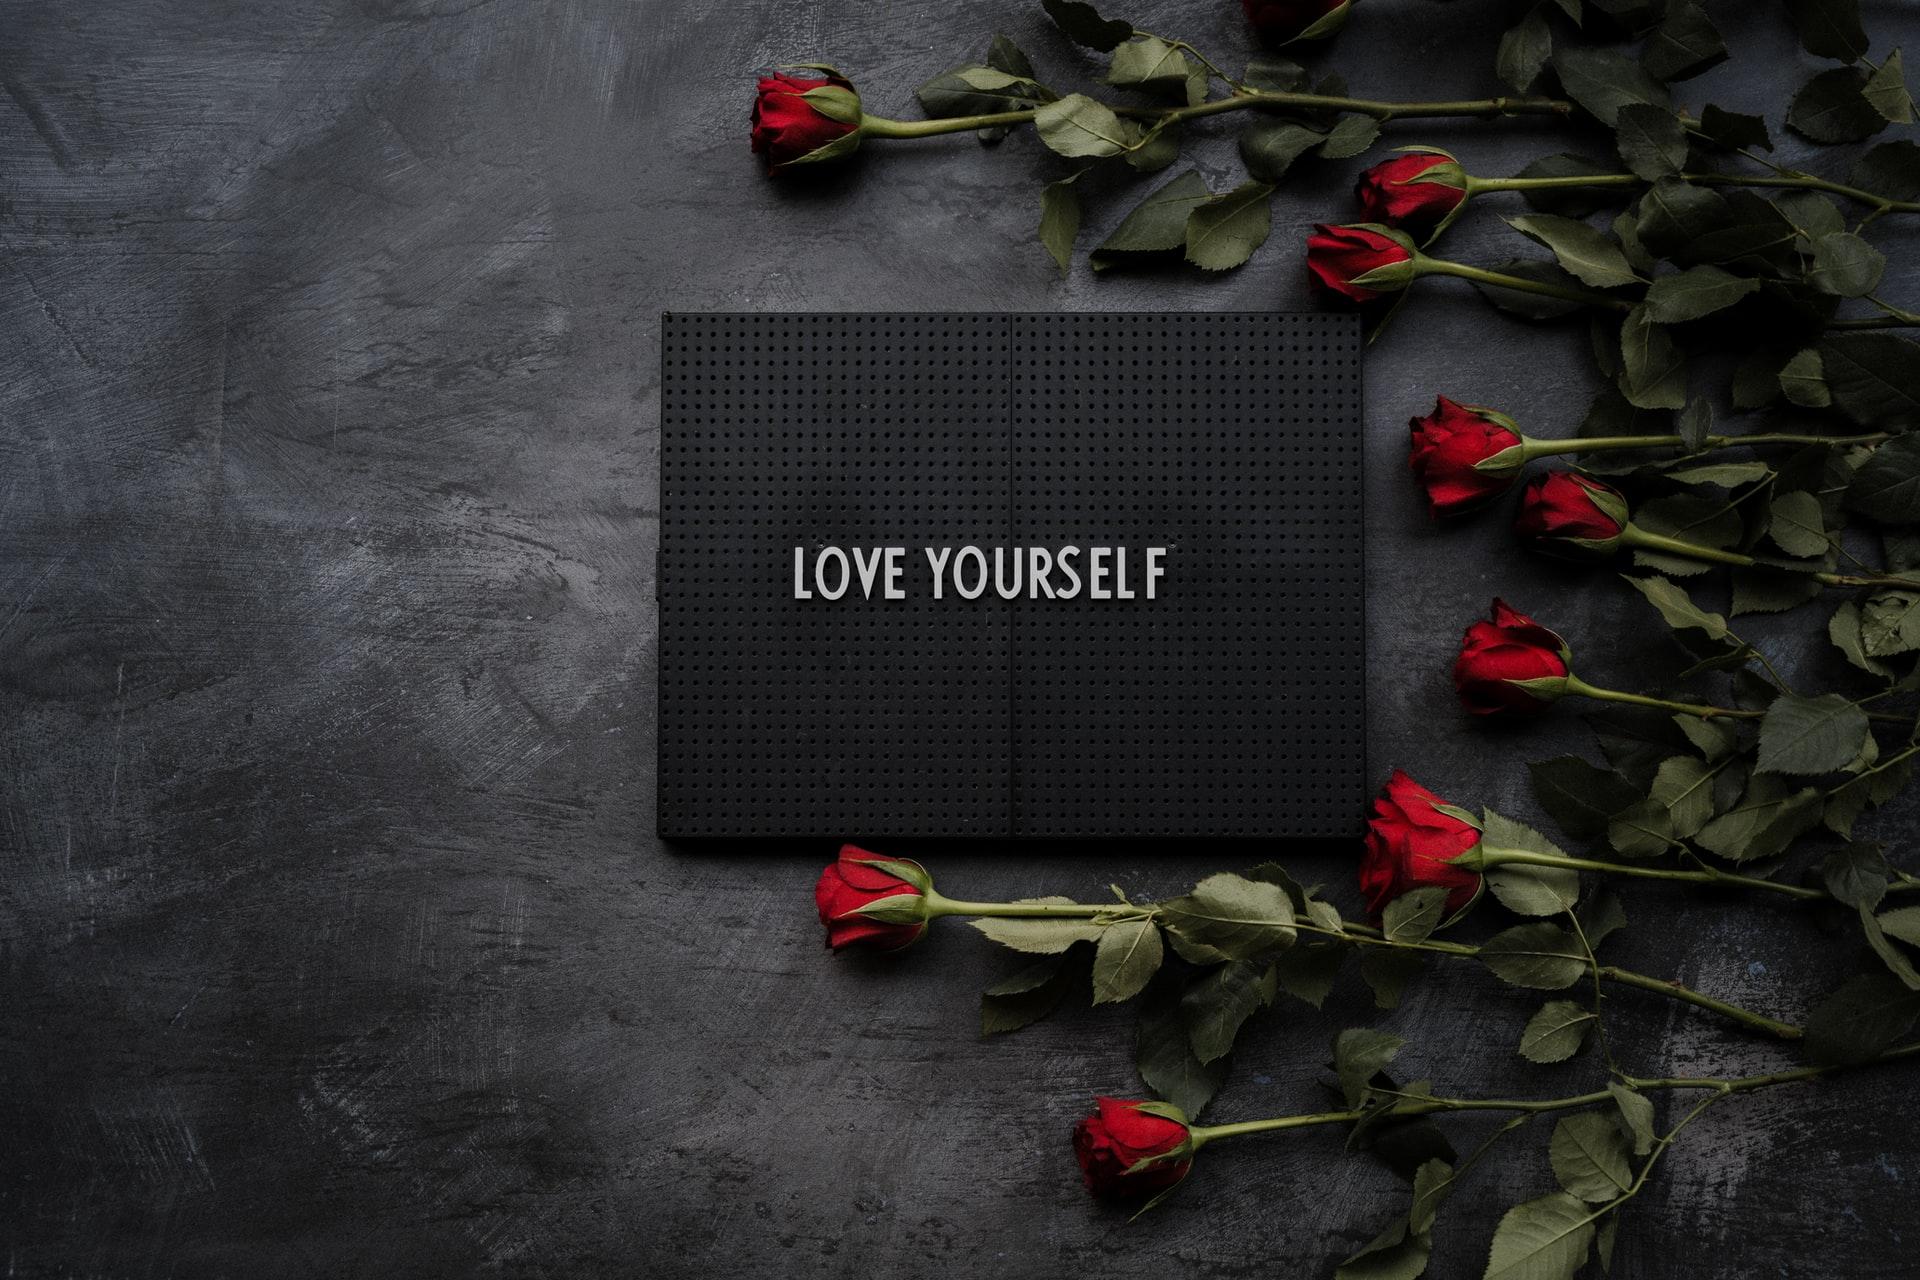 Aumentar la autoestima